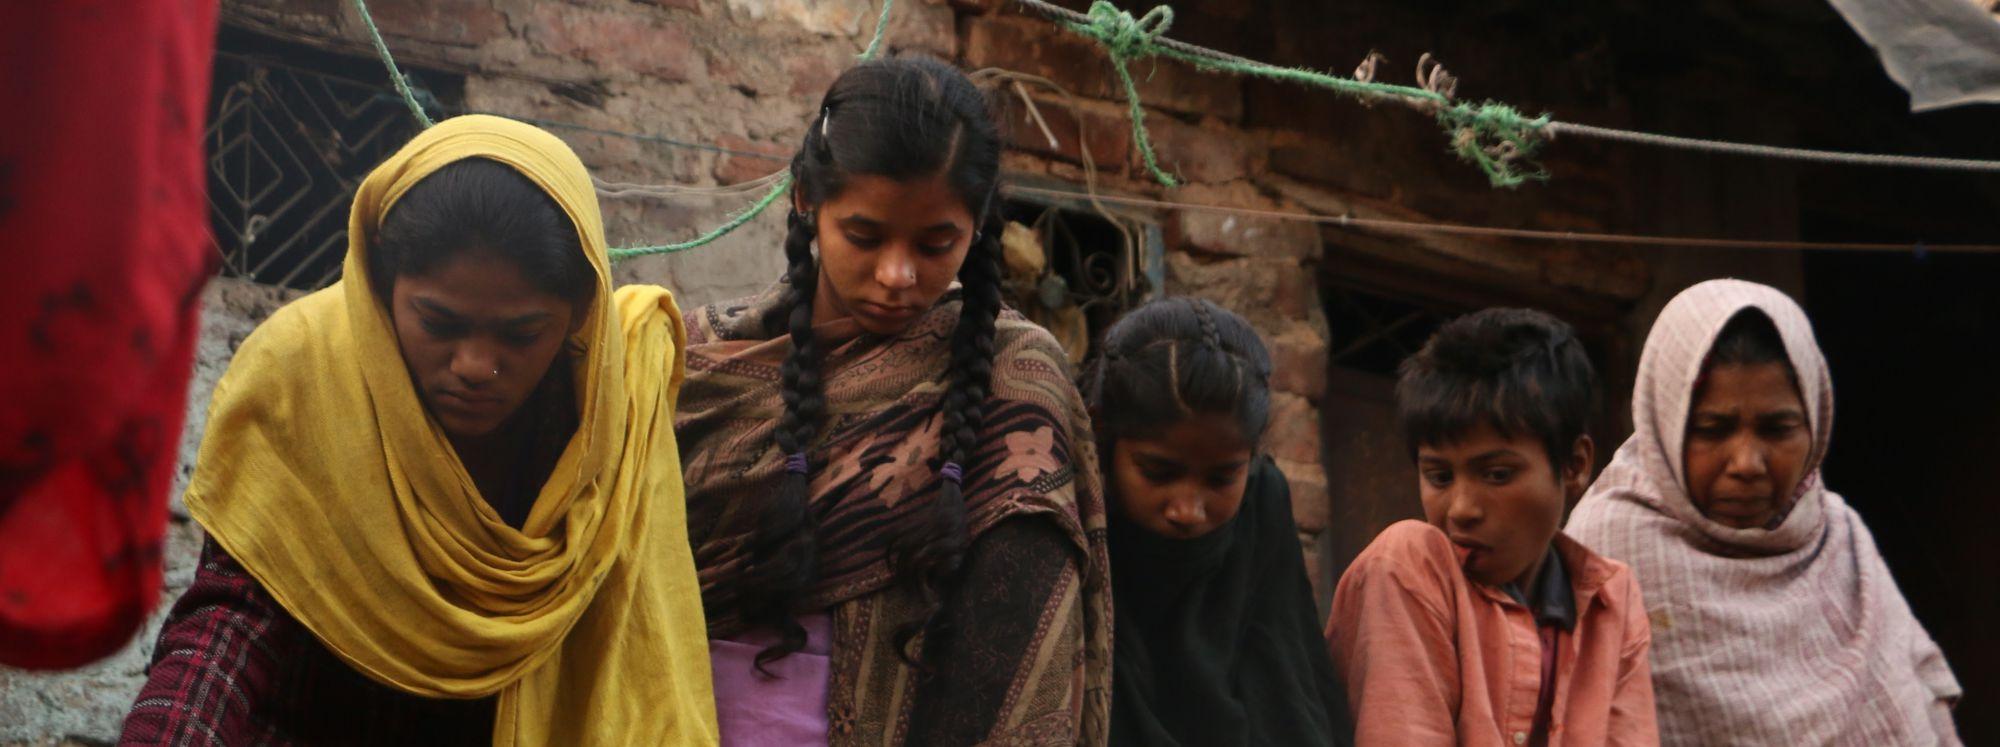 Fear, Uncertainty Loom Large As Delhi's Kathputli Colony Resists Renewed Resettlement